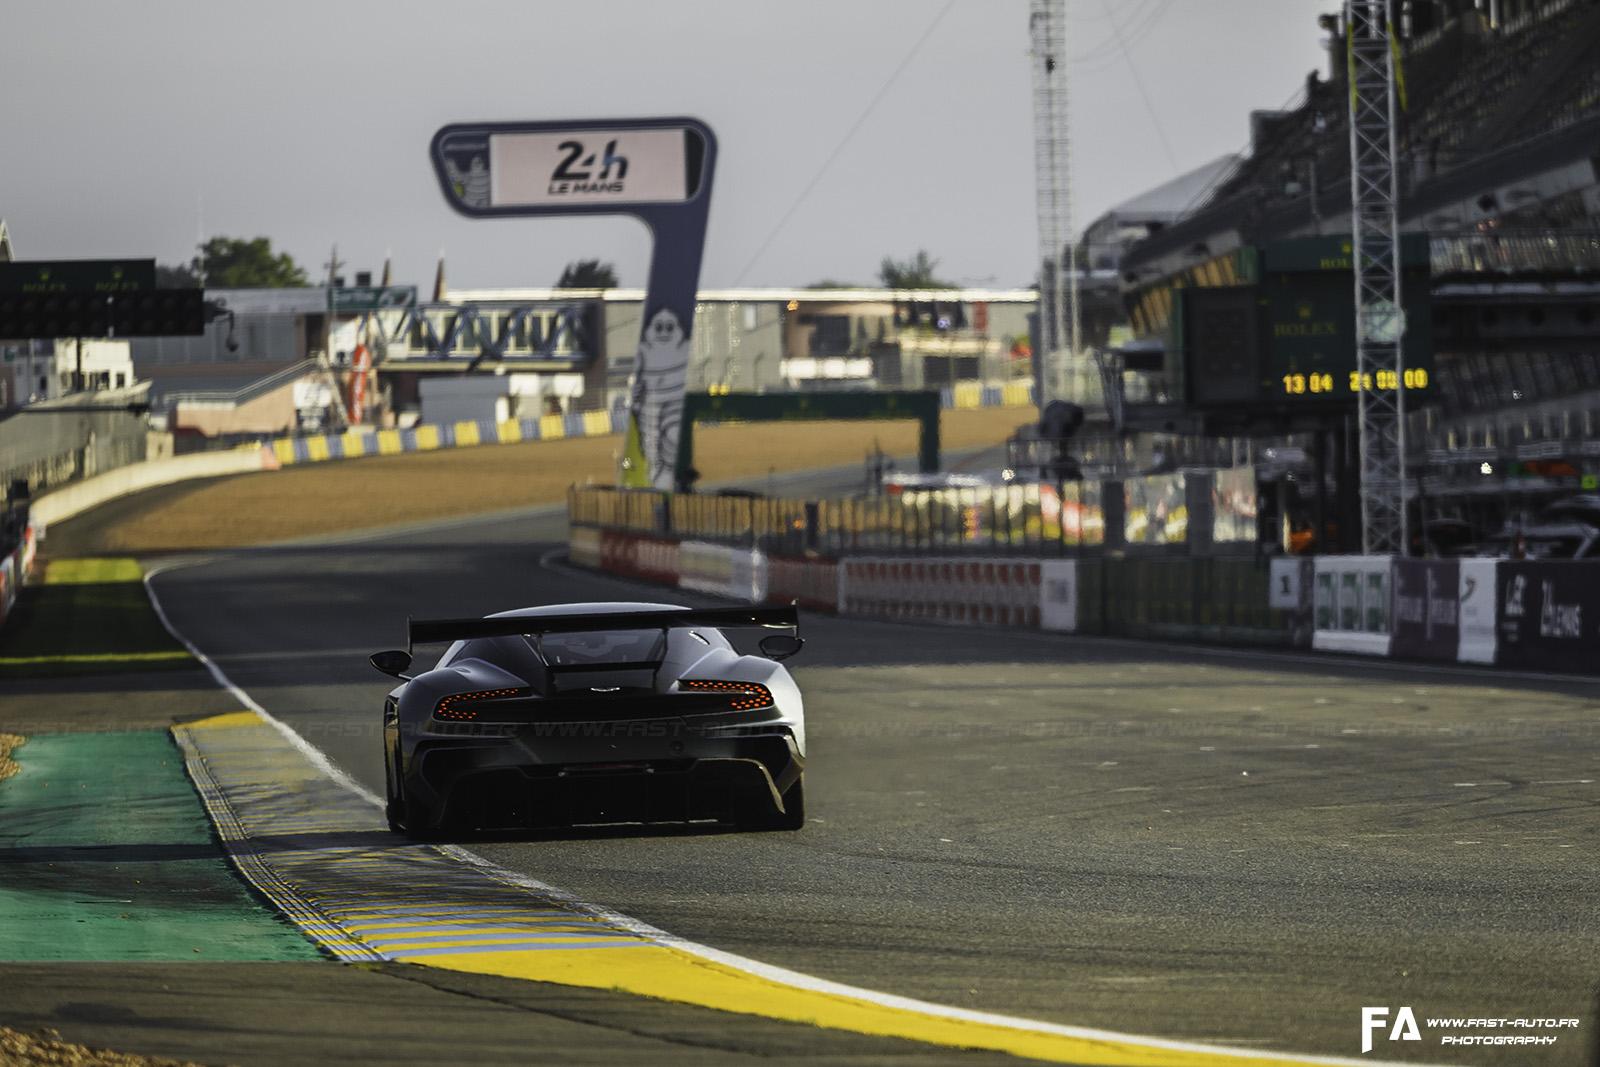 Aston Martin Vulcan - Circuit/Track